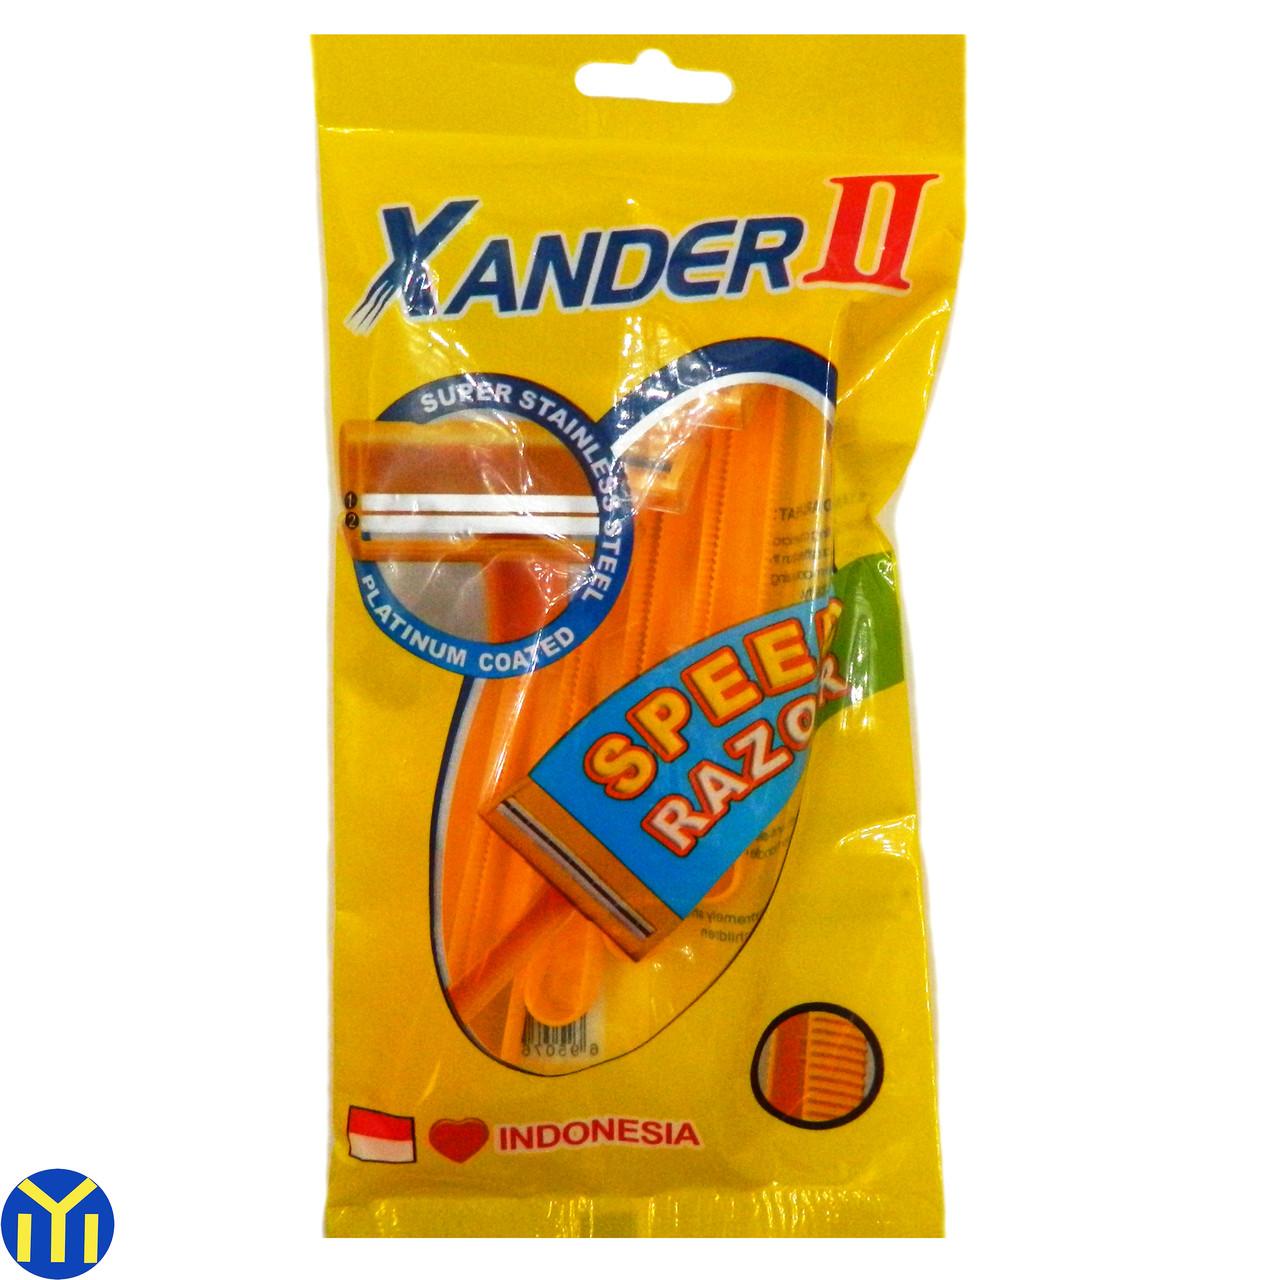 Станки для бритья Xander ll 5шт/уп.